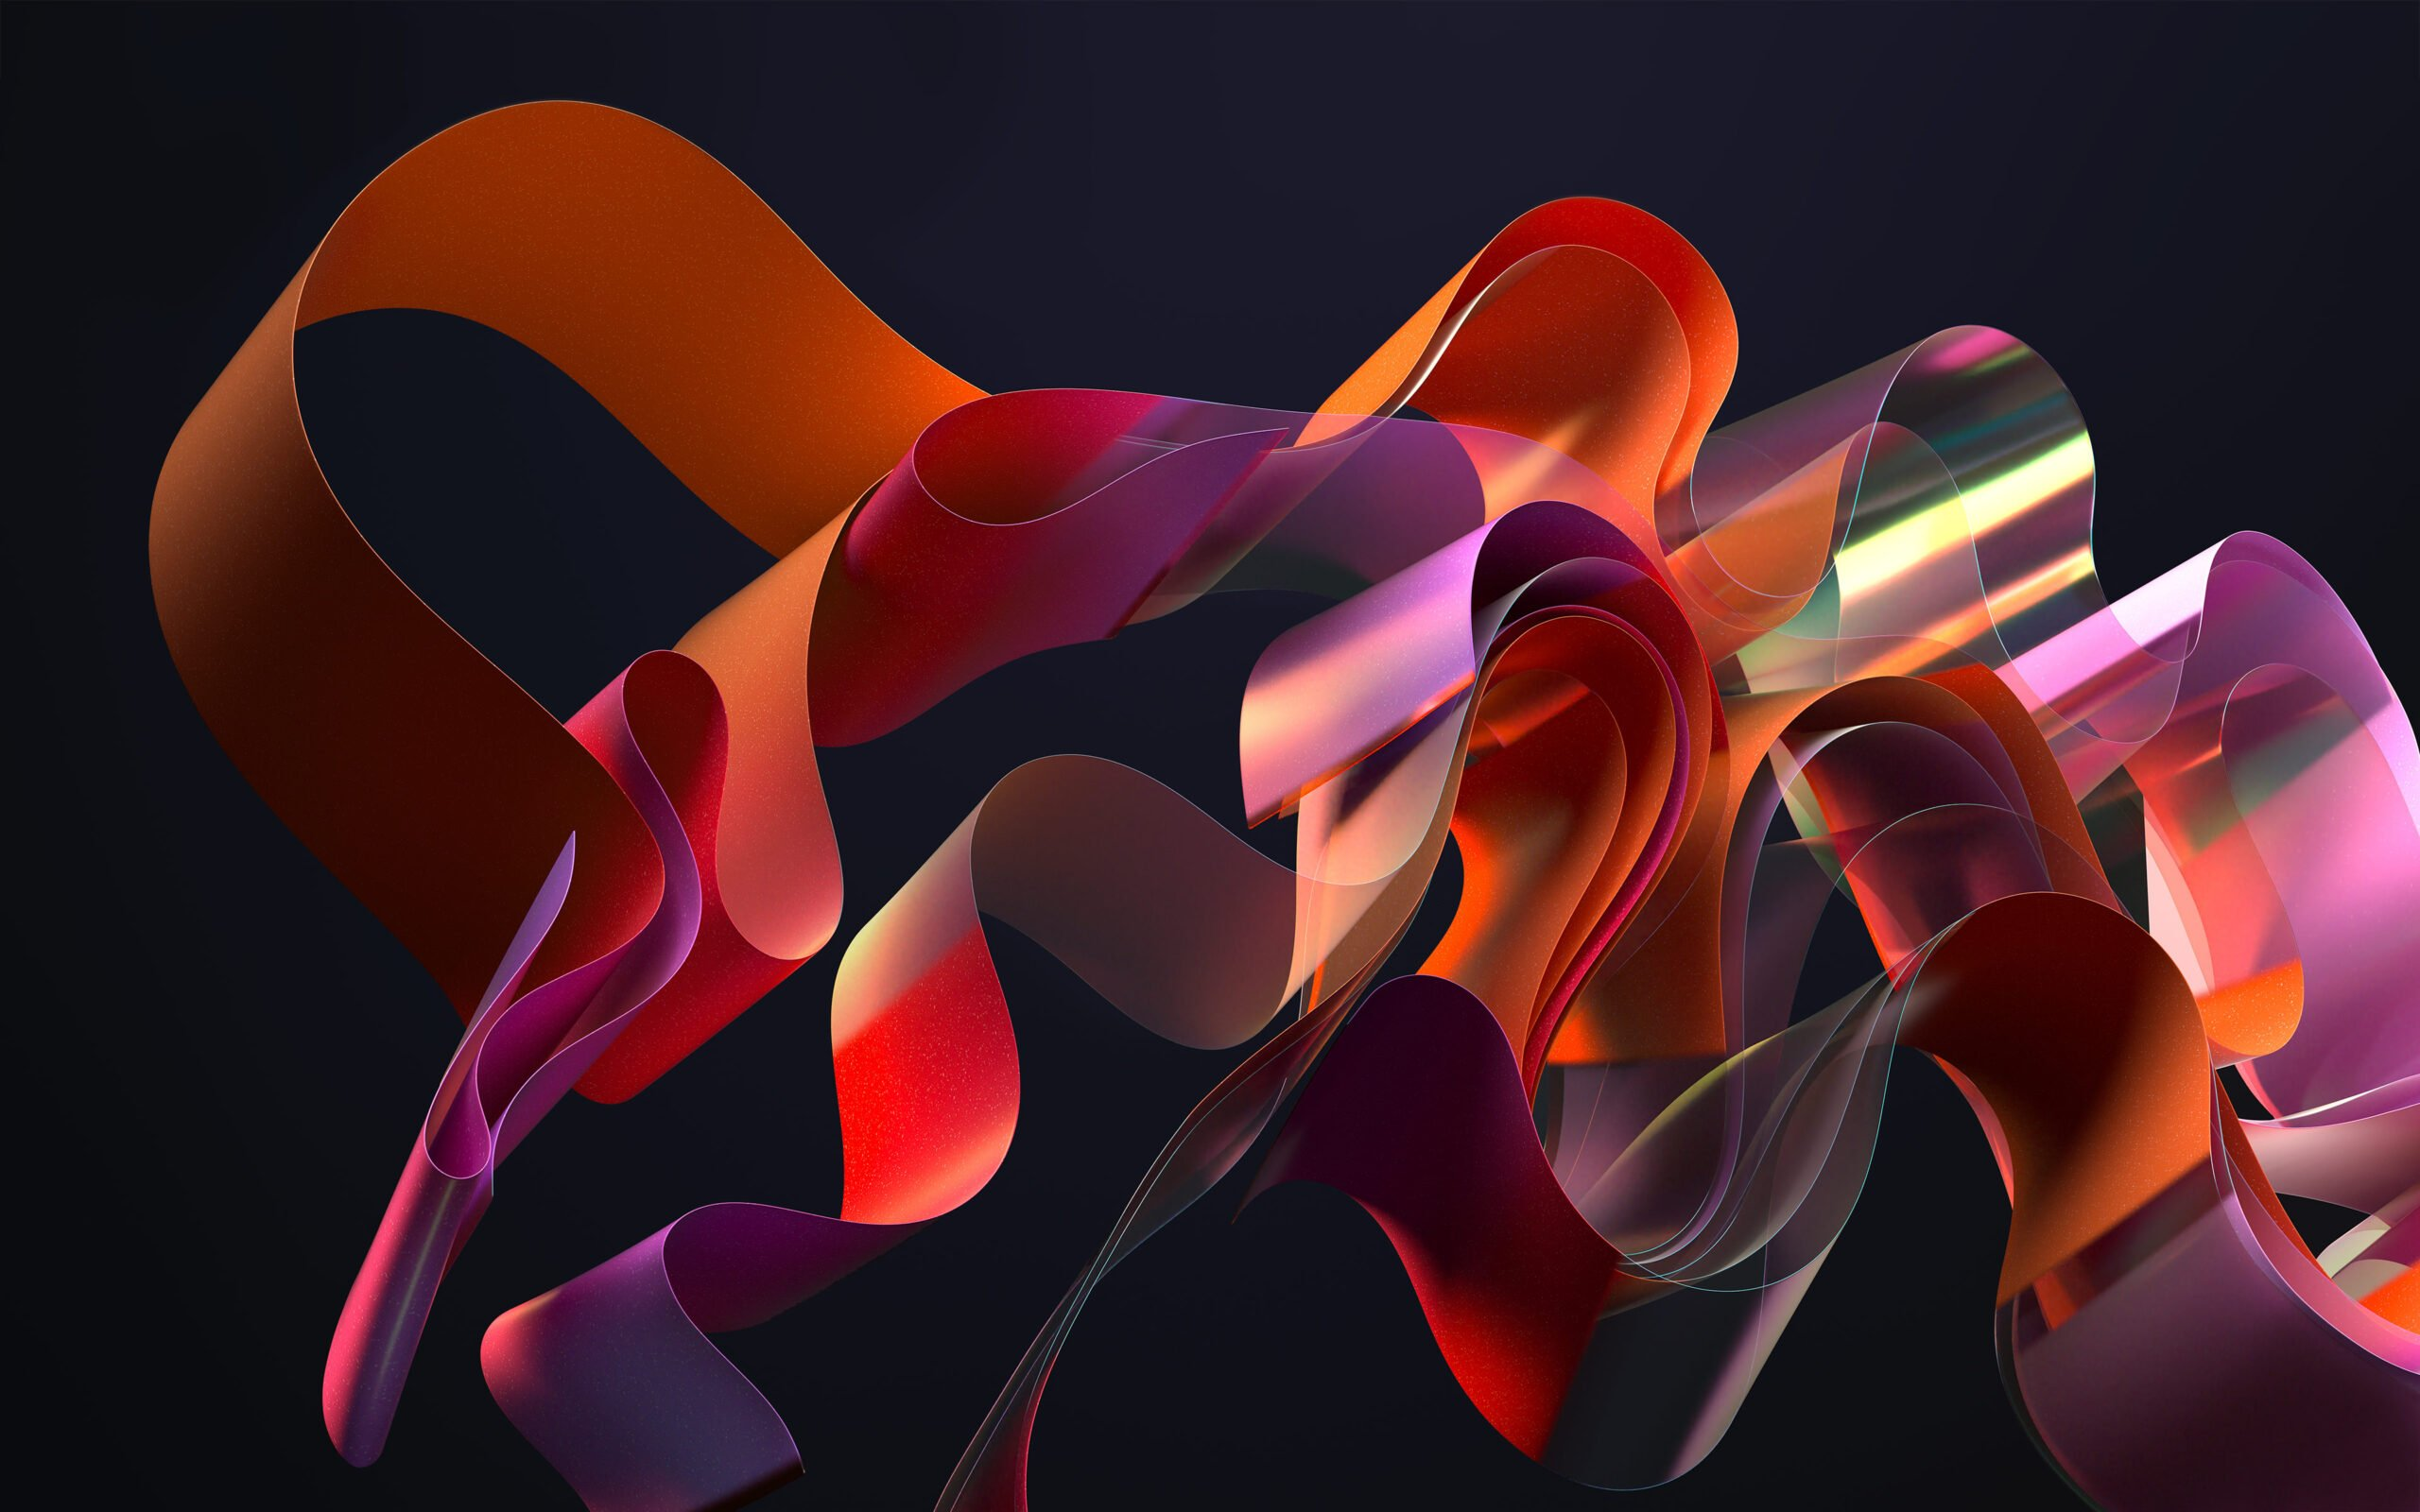 Windows 11 - Captured Motion Theme Image - Microsoft